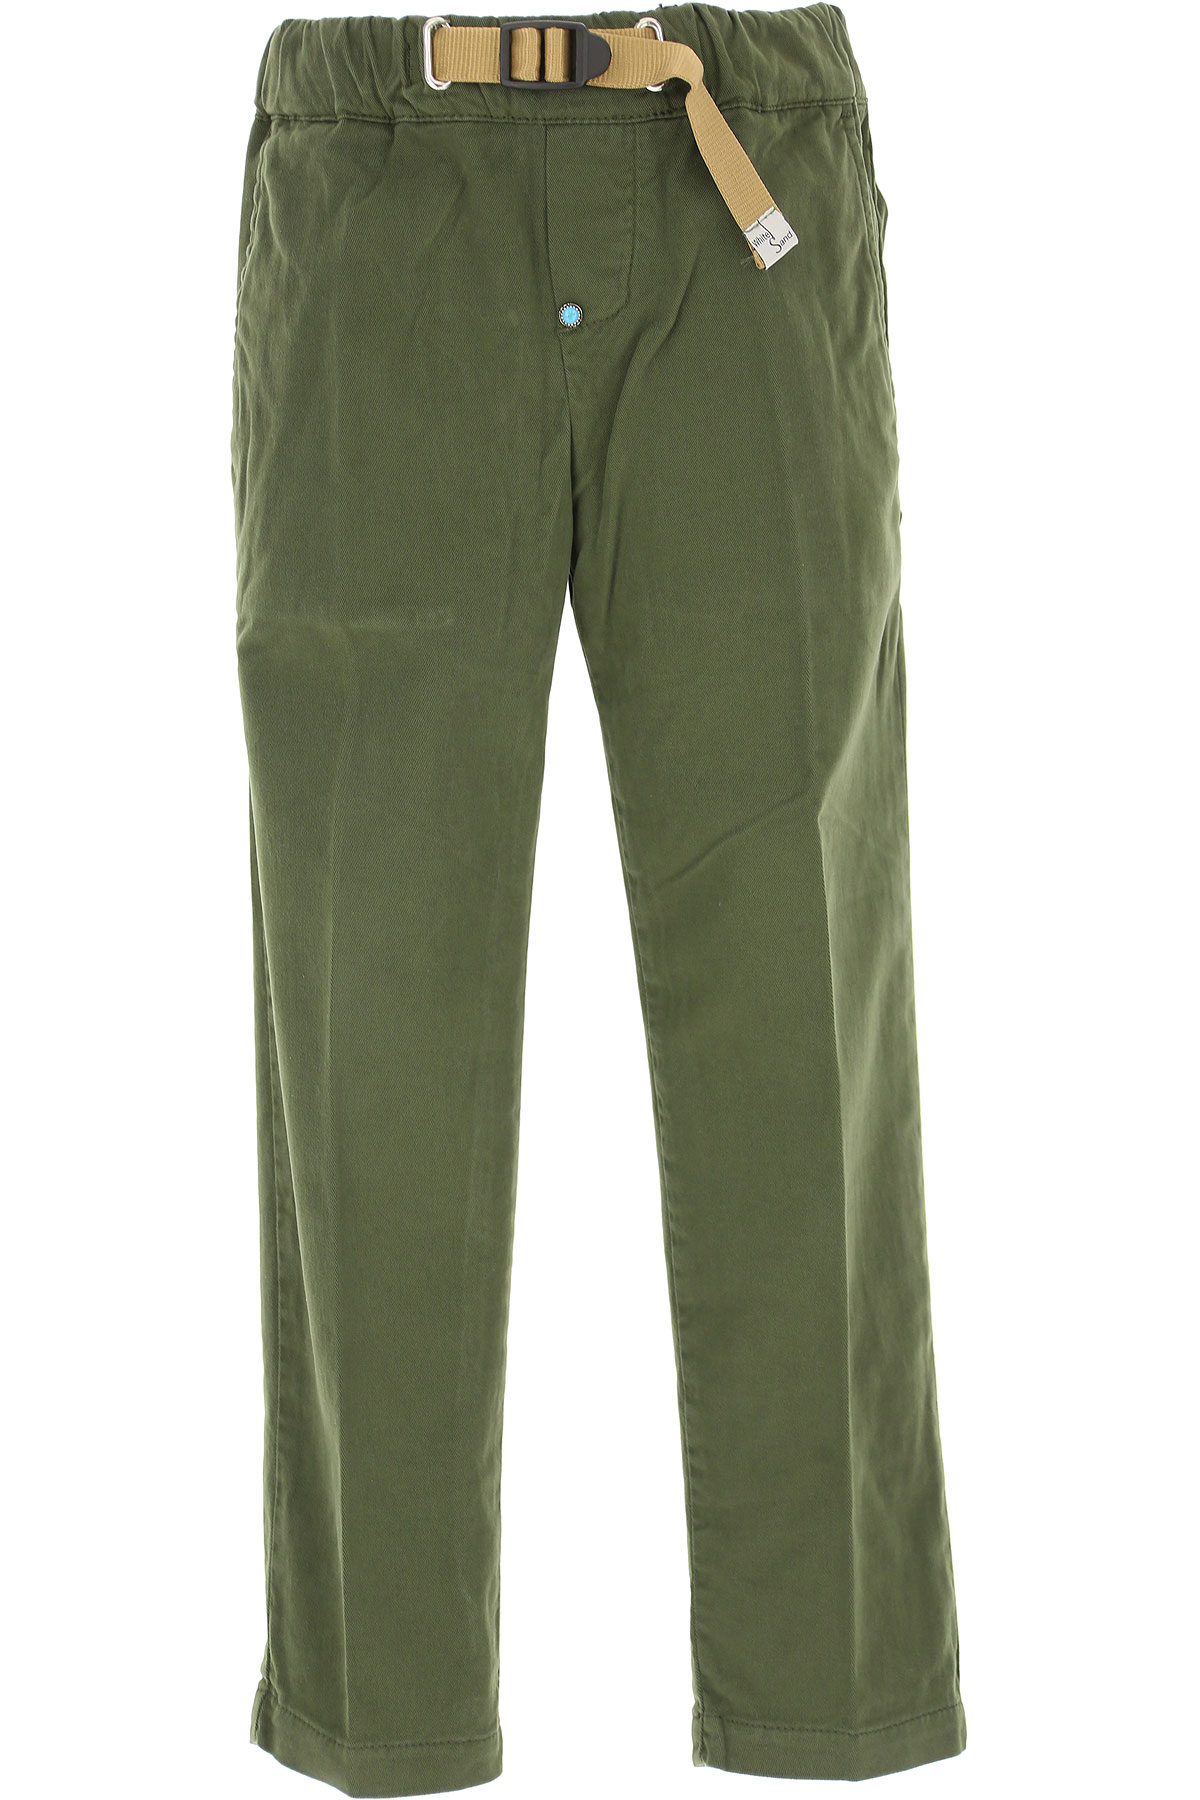 Image of White Sand Kids Pants for Boys, Military Green, Cotton, 2017, 10Y 14Y 2Y 4Y 6Y 8Y